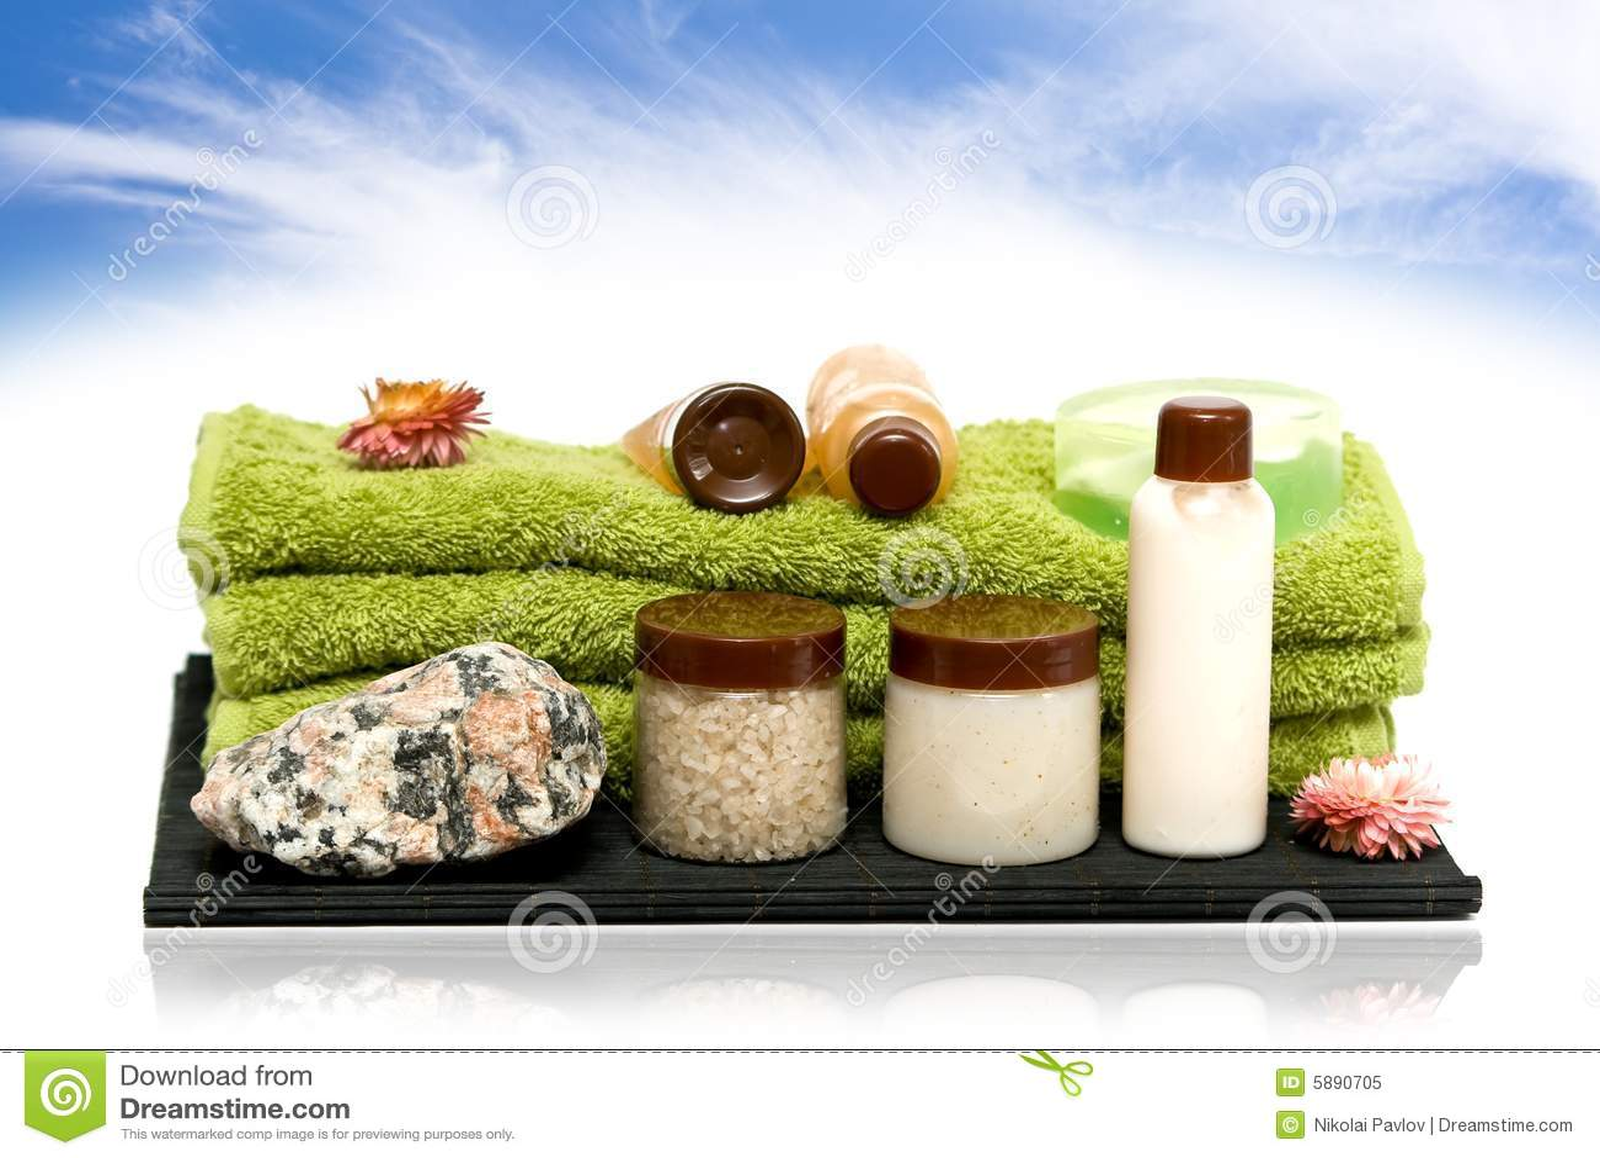 Badekurorthygienehilfsmittel für Badekurort